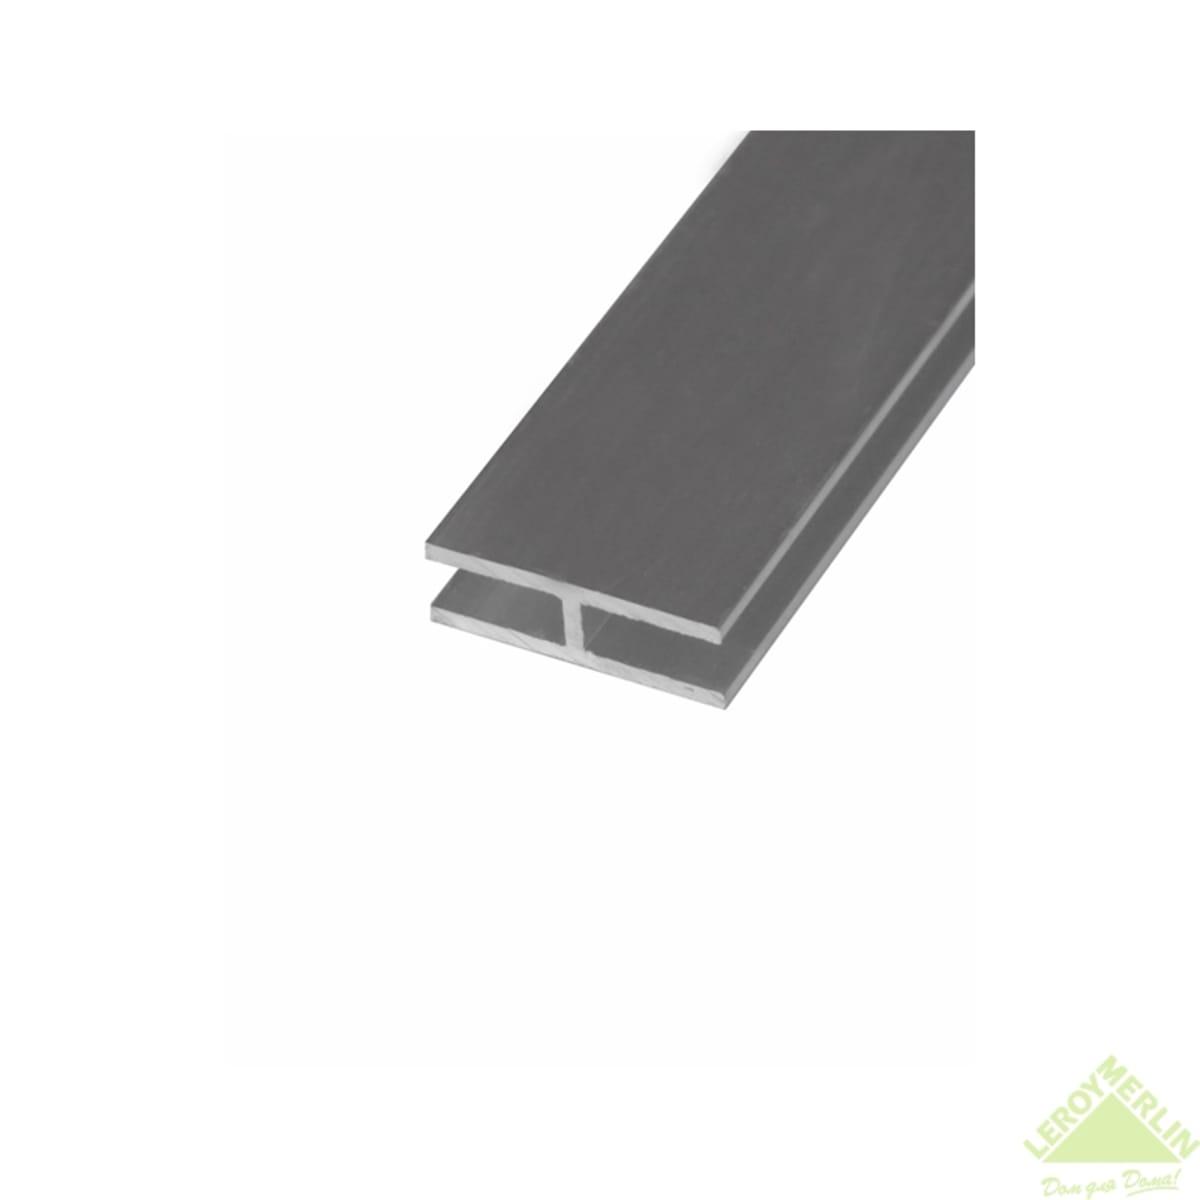 Двутавр алюминиевый 25х13х25х1,5 мм, 1 м, цвет серебро